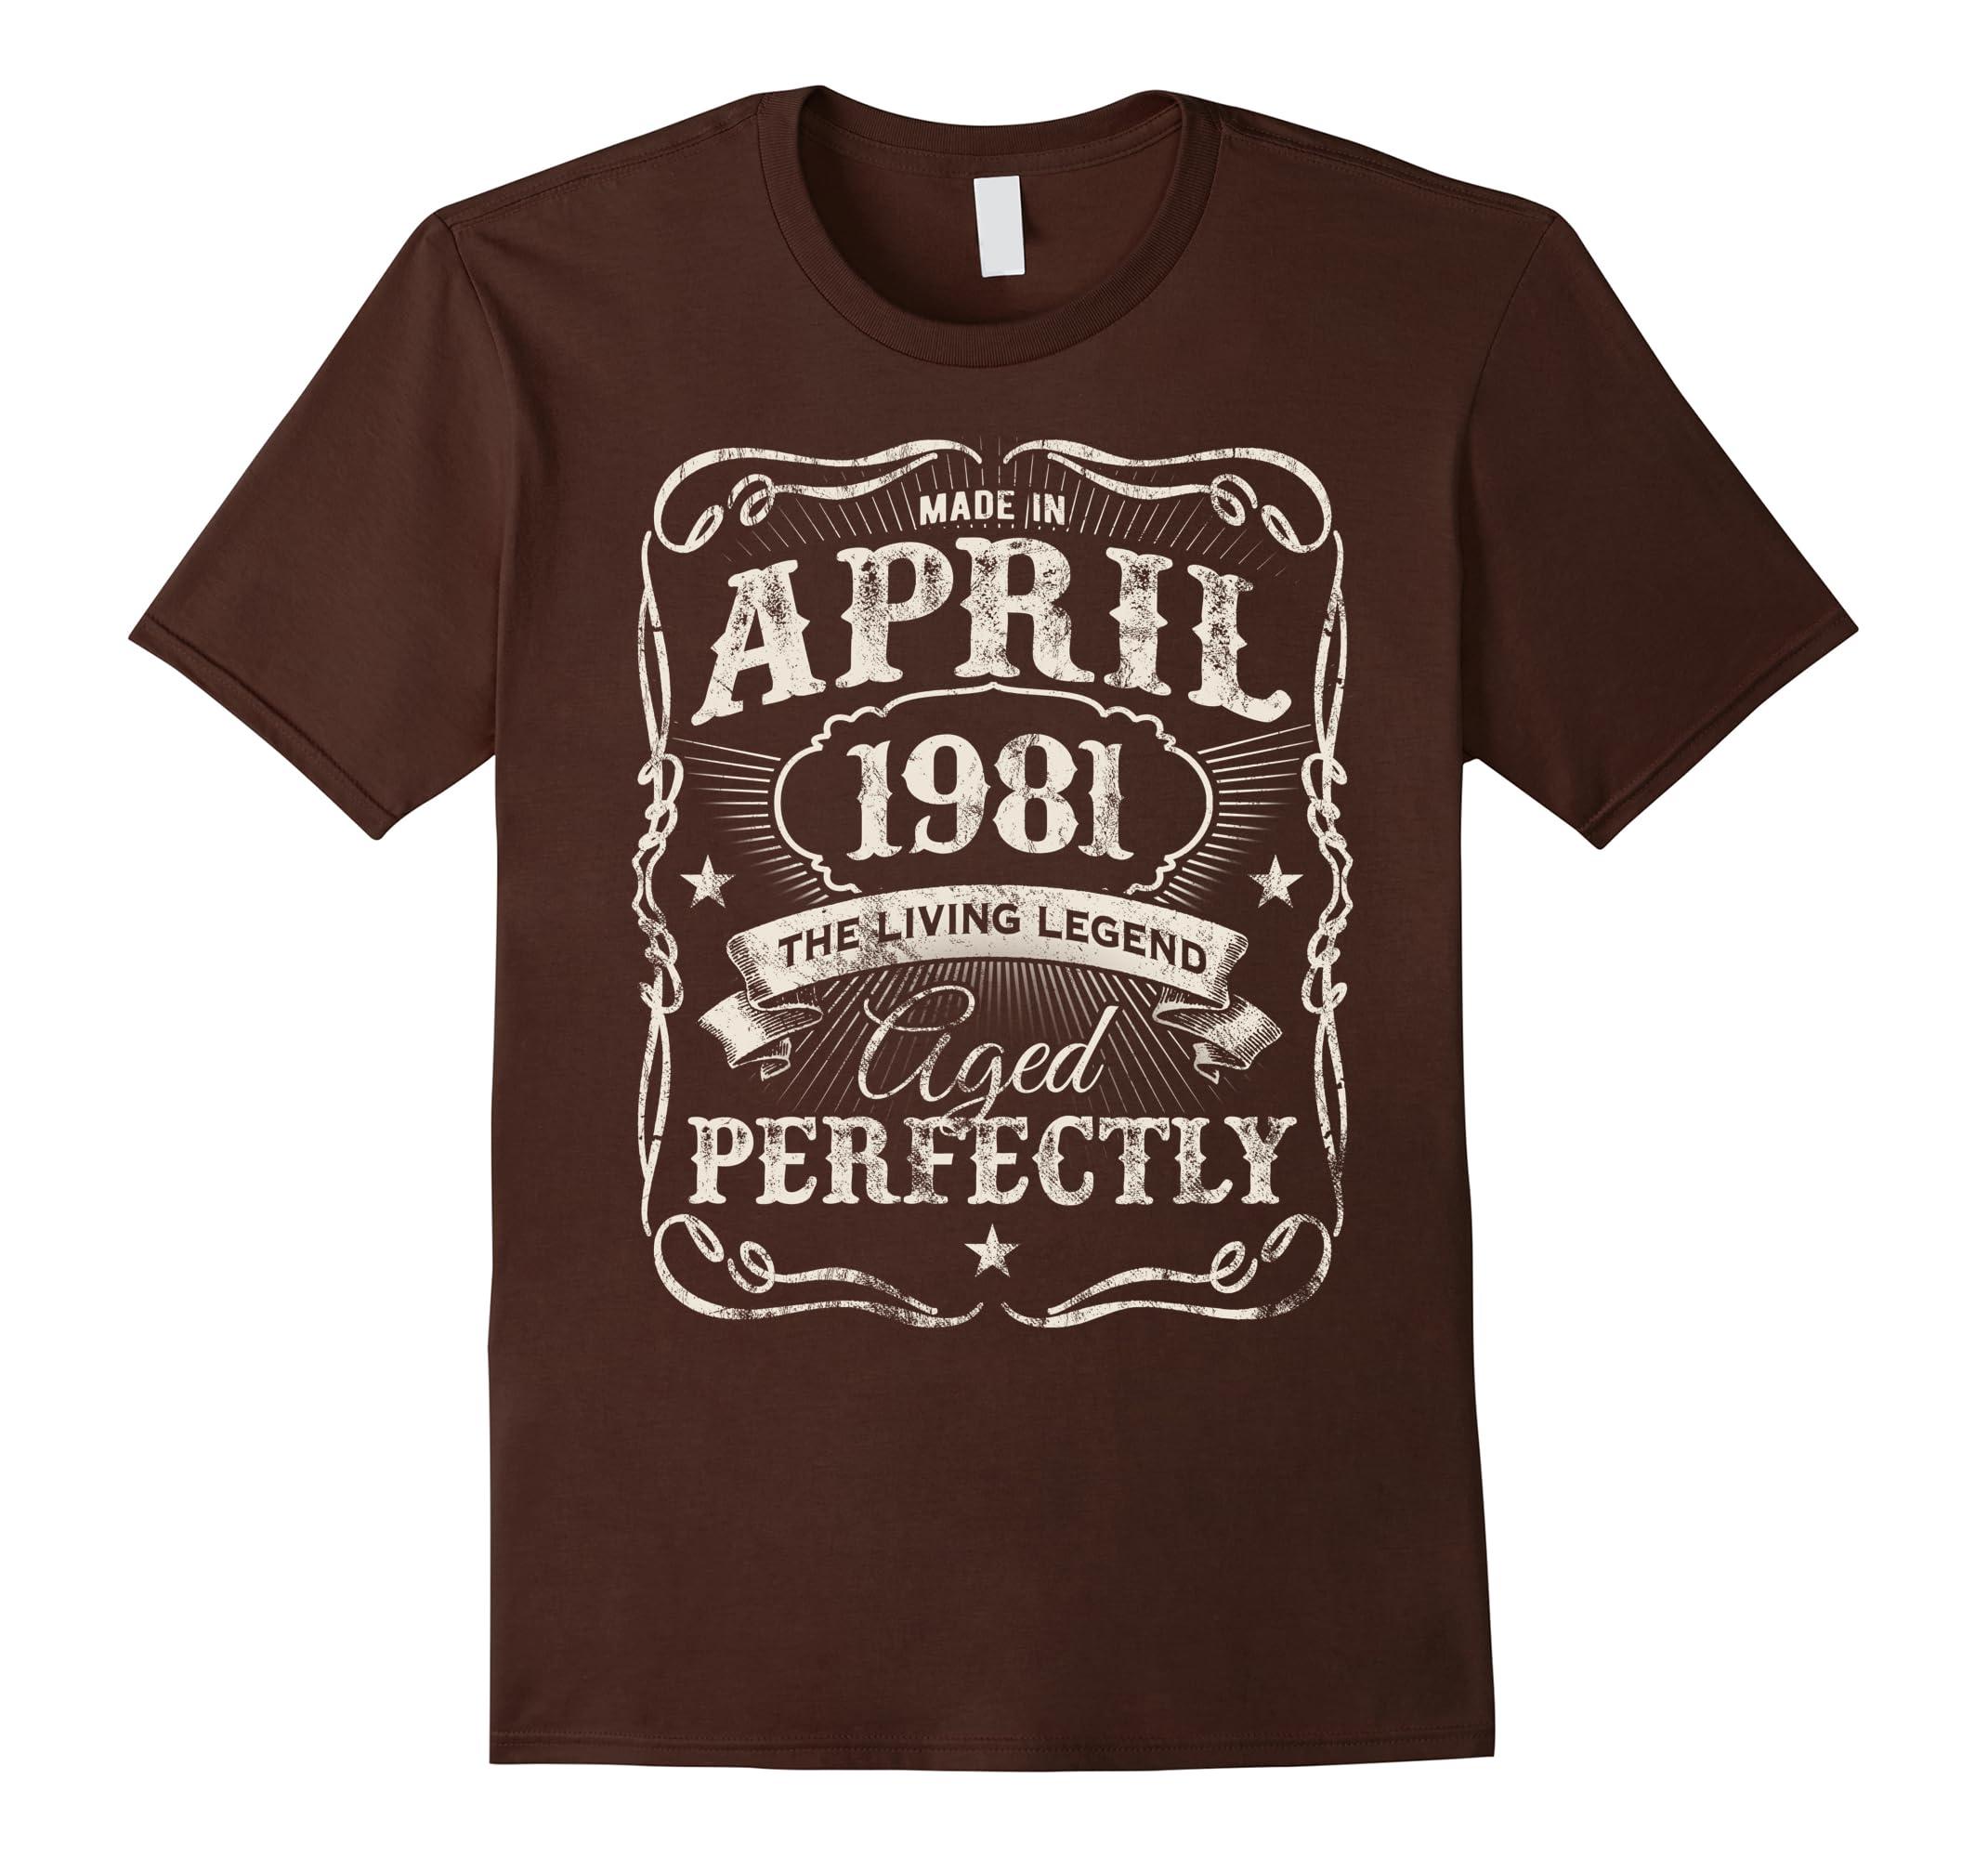 9b2ca62d2e4 Legends Were Born In April 1981 T-Shirt 37th Birthday Gift-ah my ...